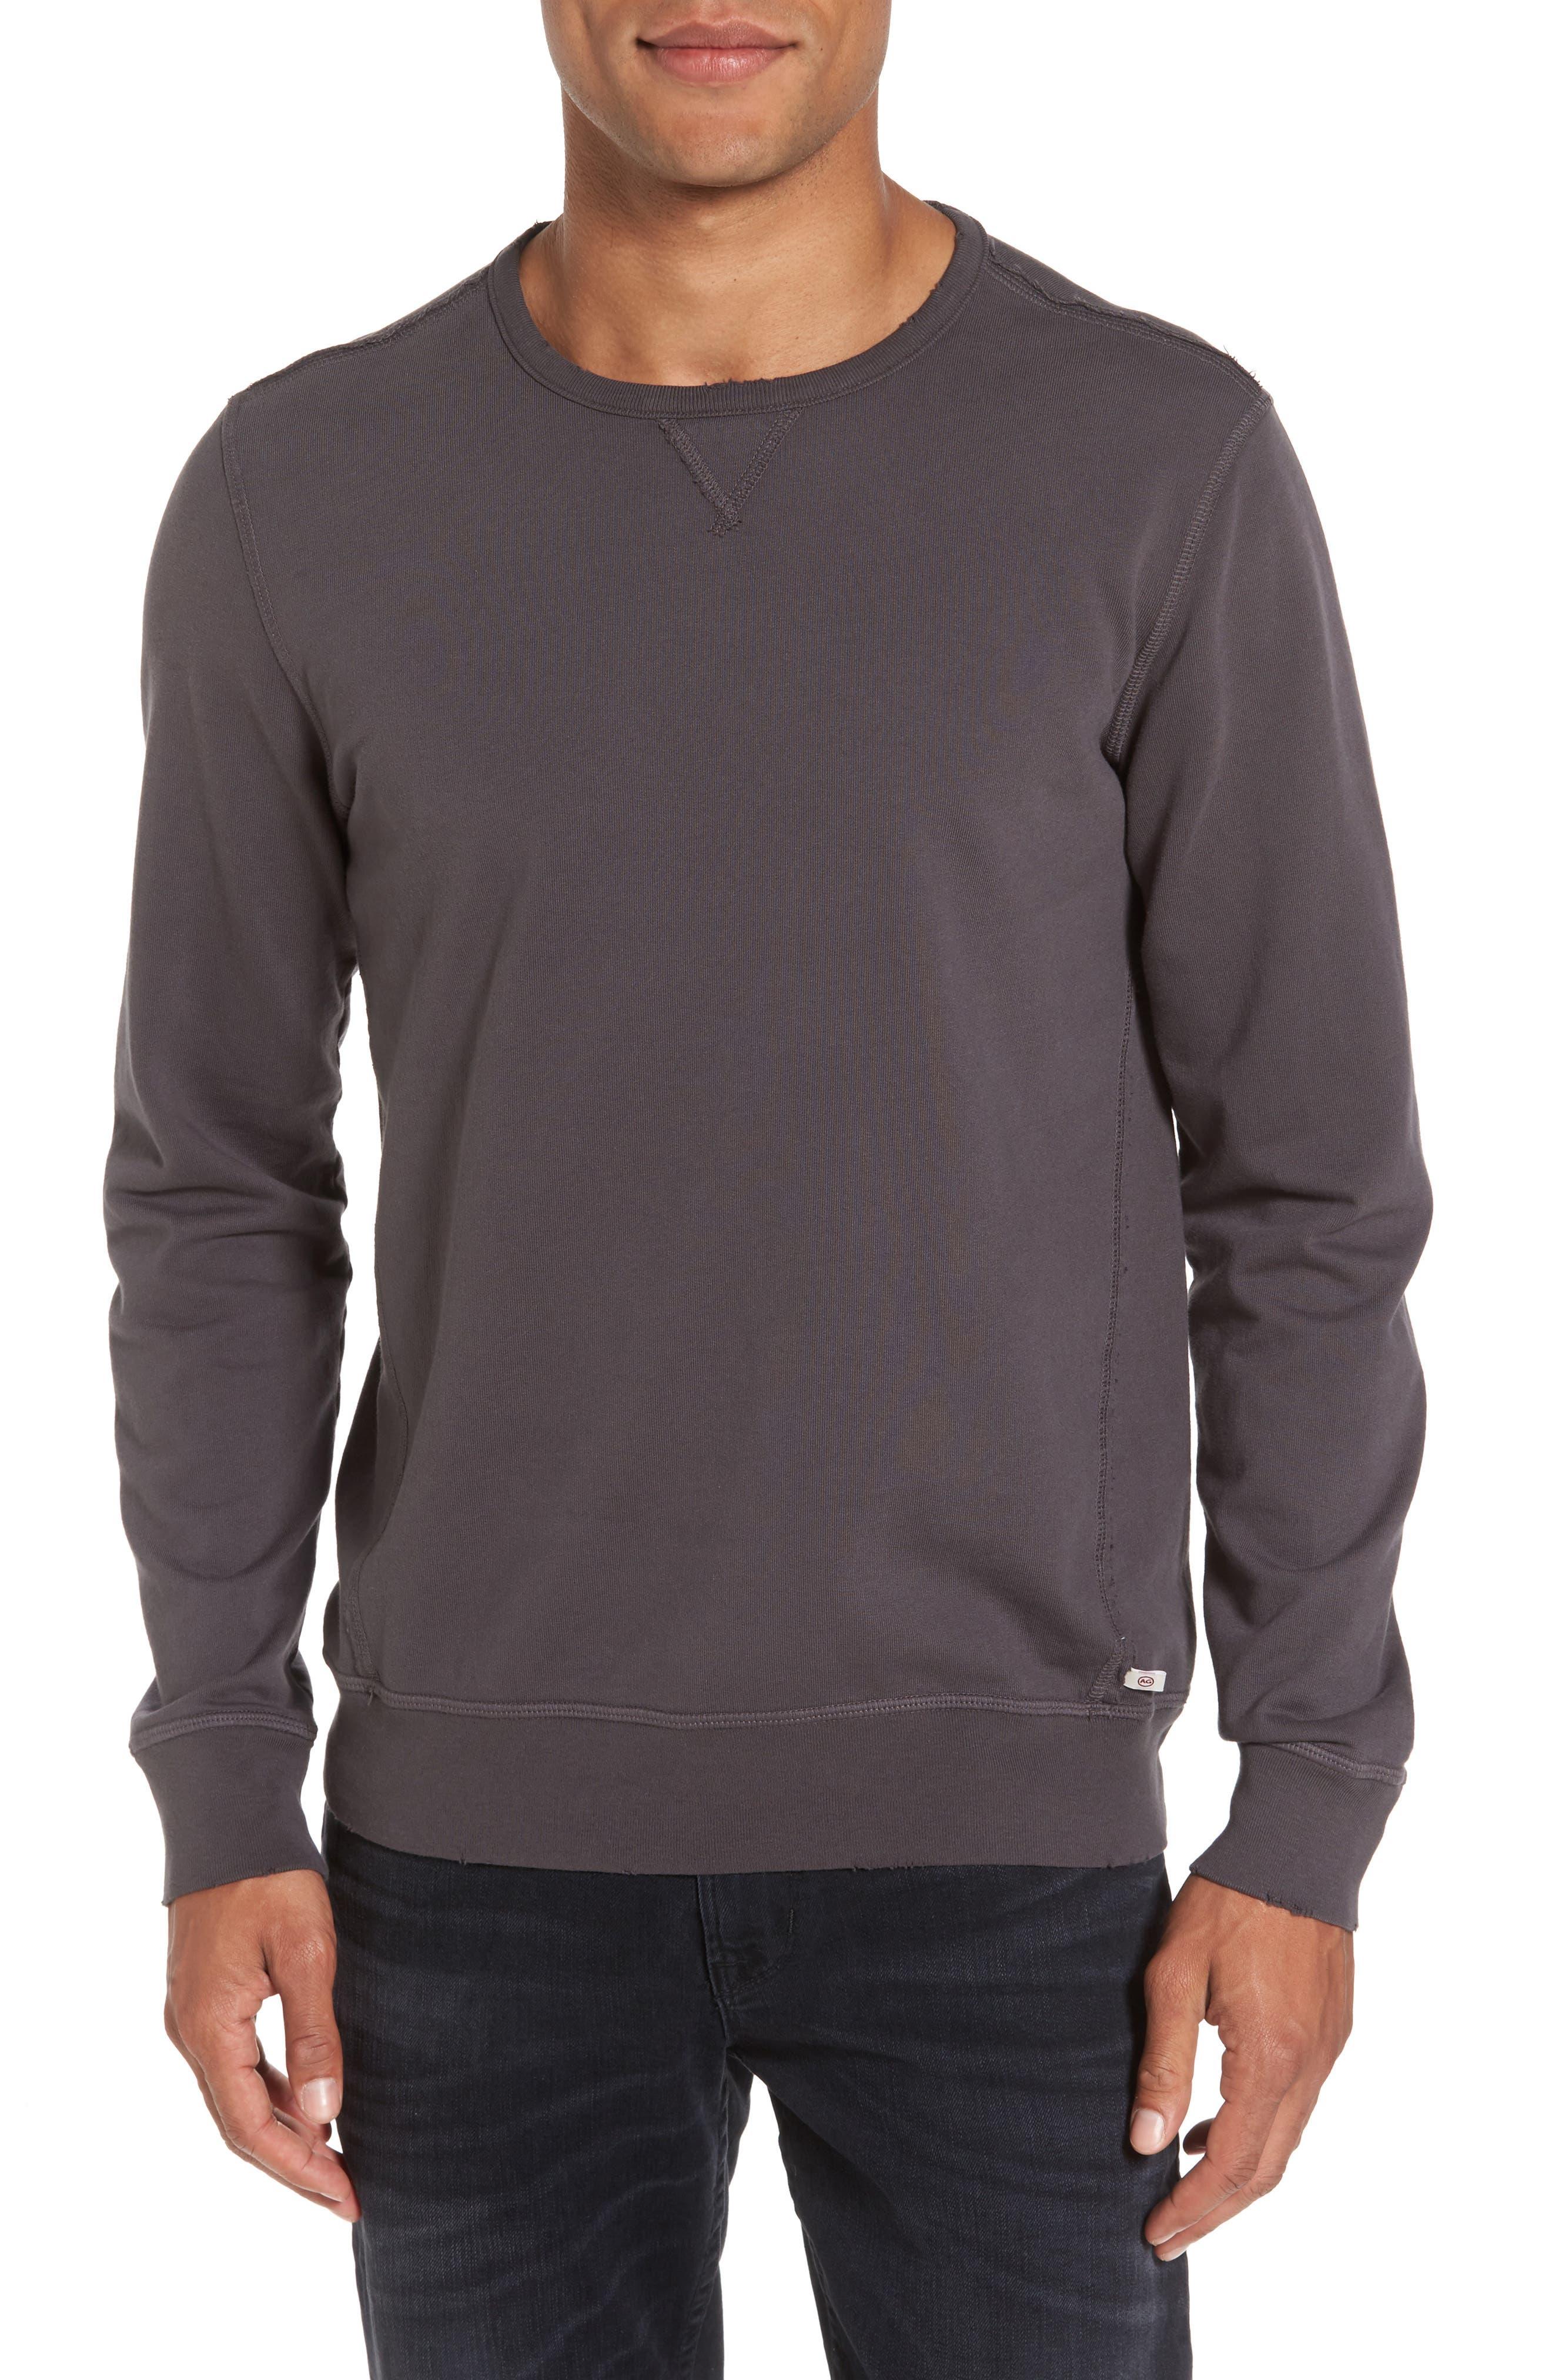 Tyson Slim Fit Sweatshirt,                             Main thumbnail 1, color,                             022